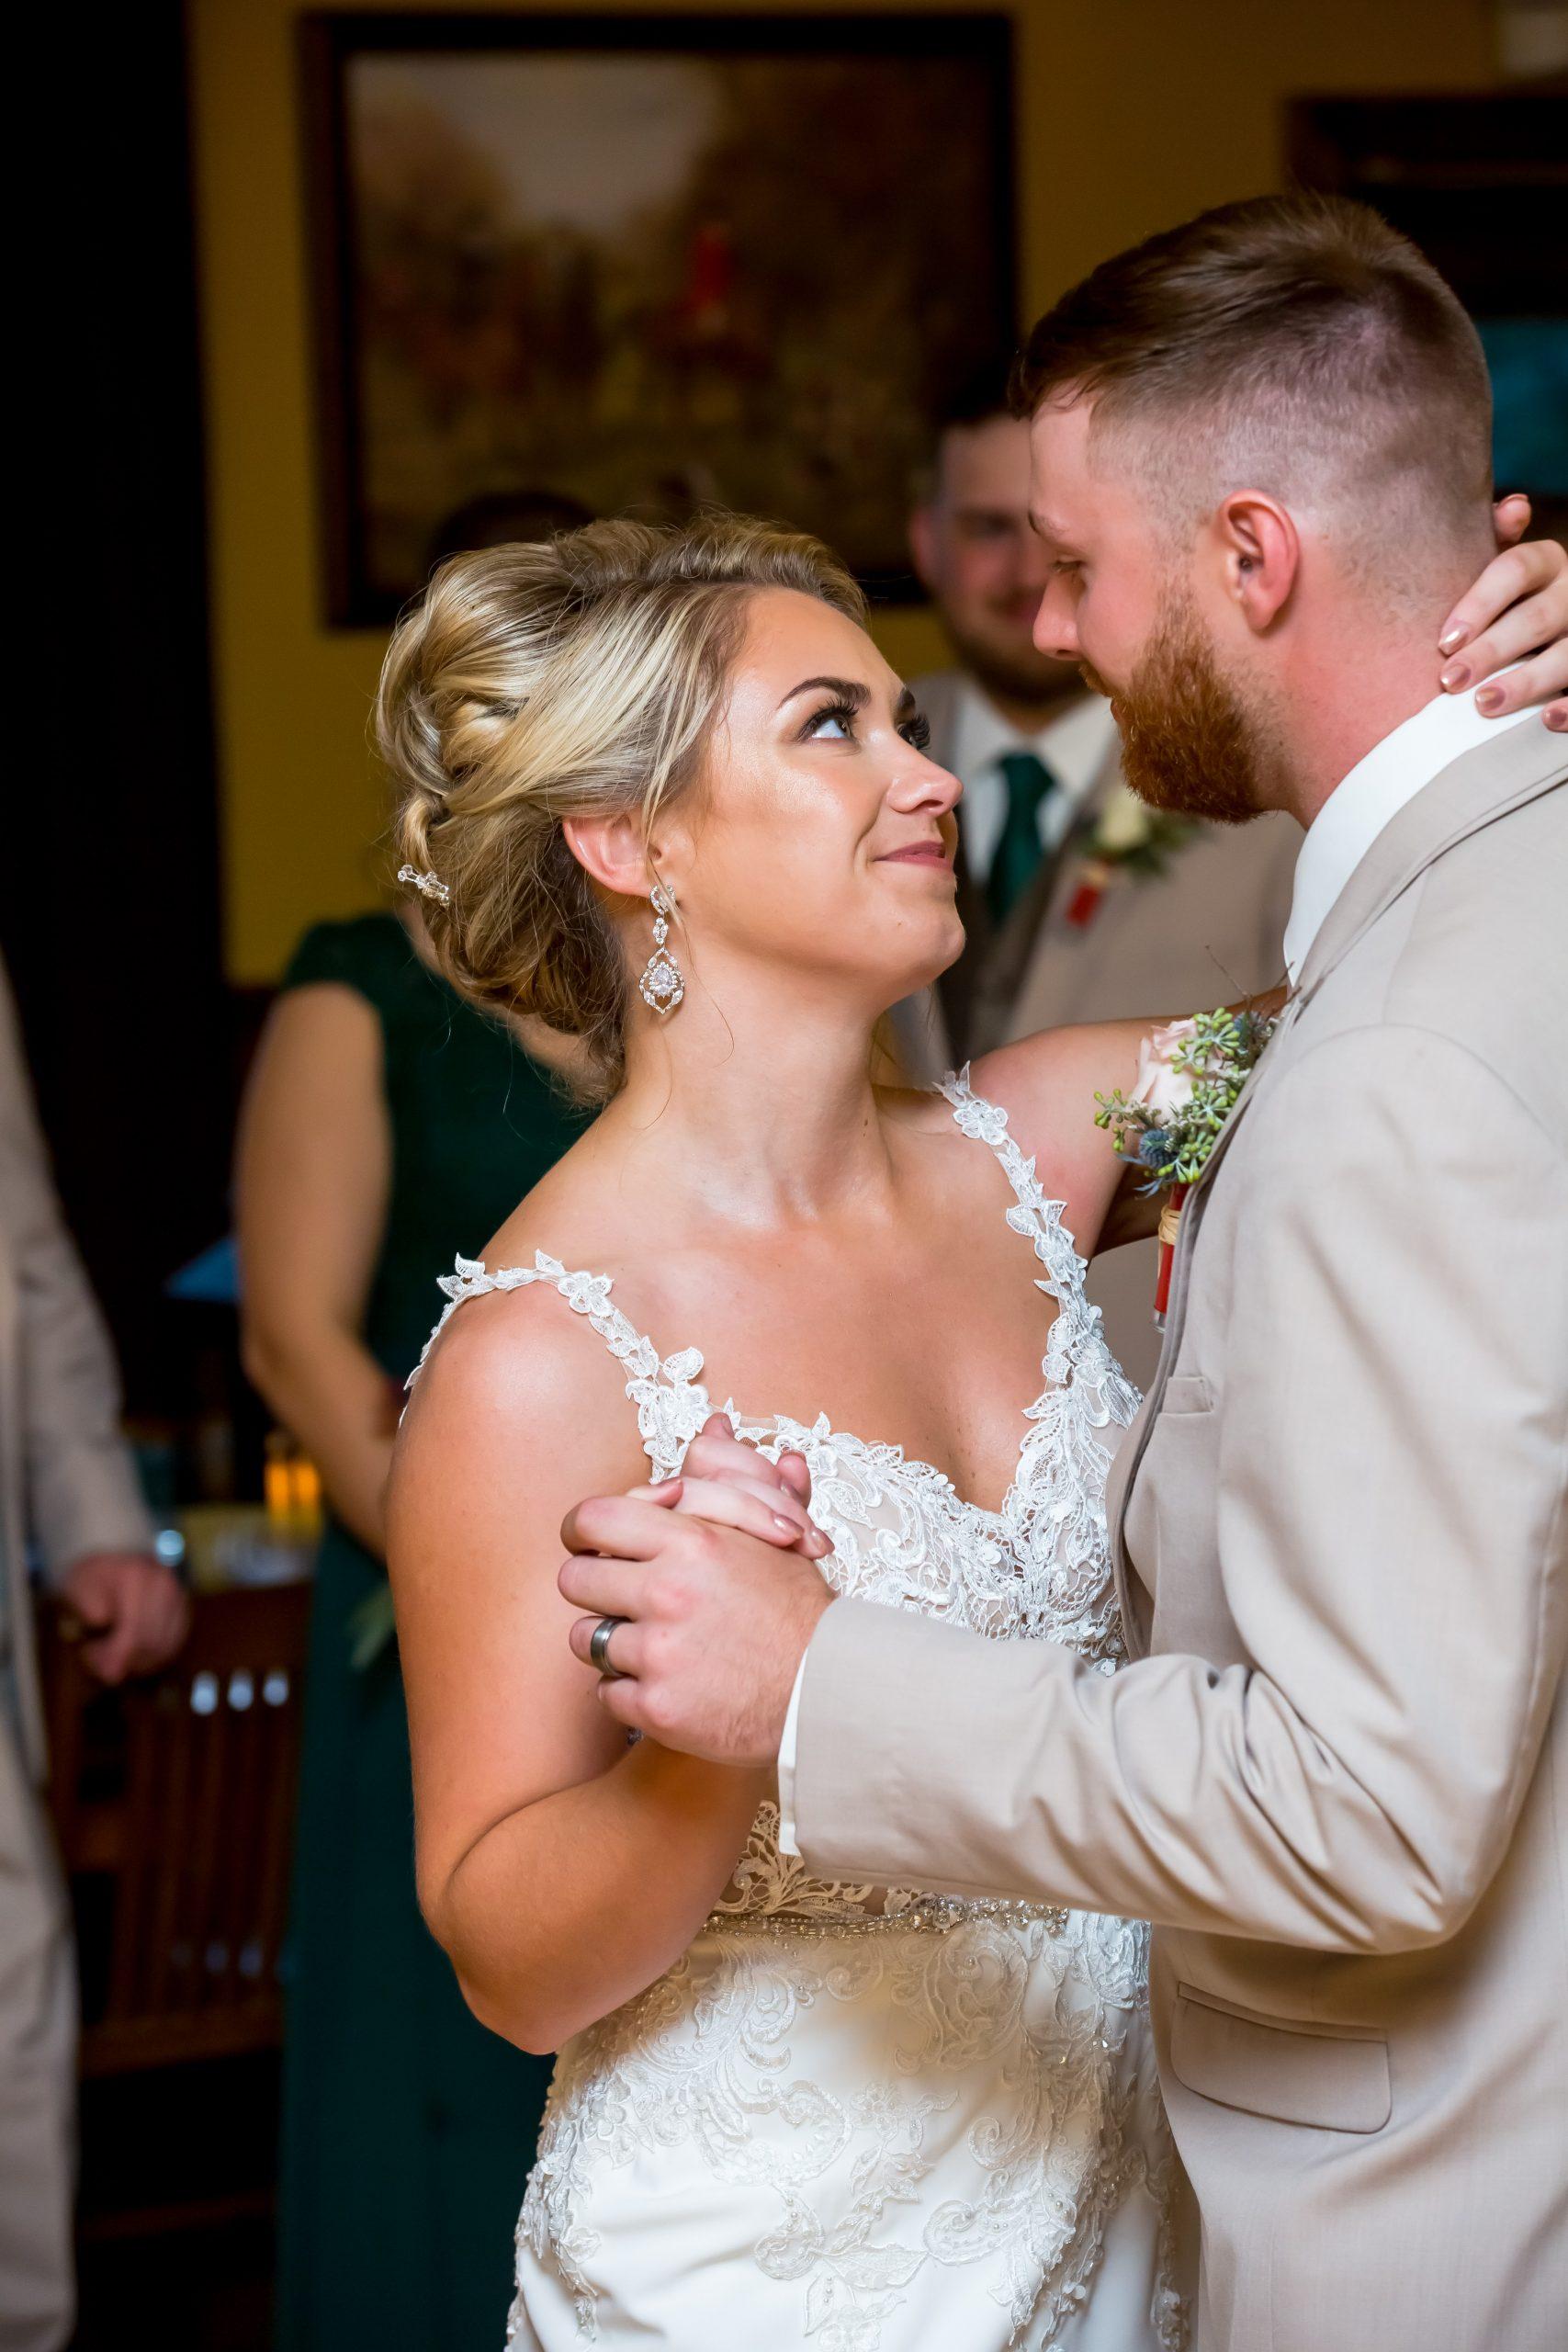 liberty_ridge_wedding23.jpg